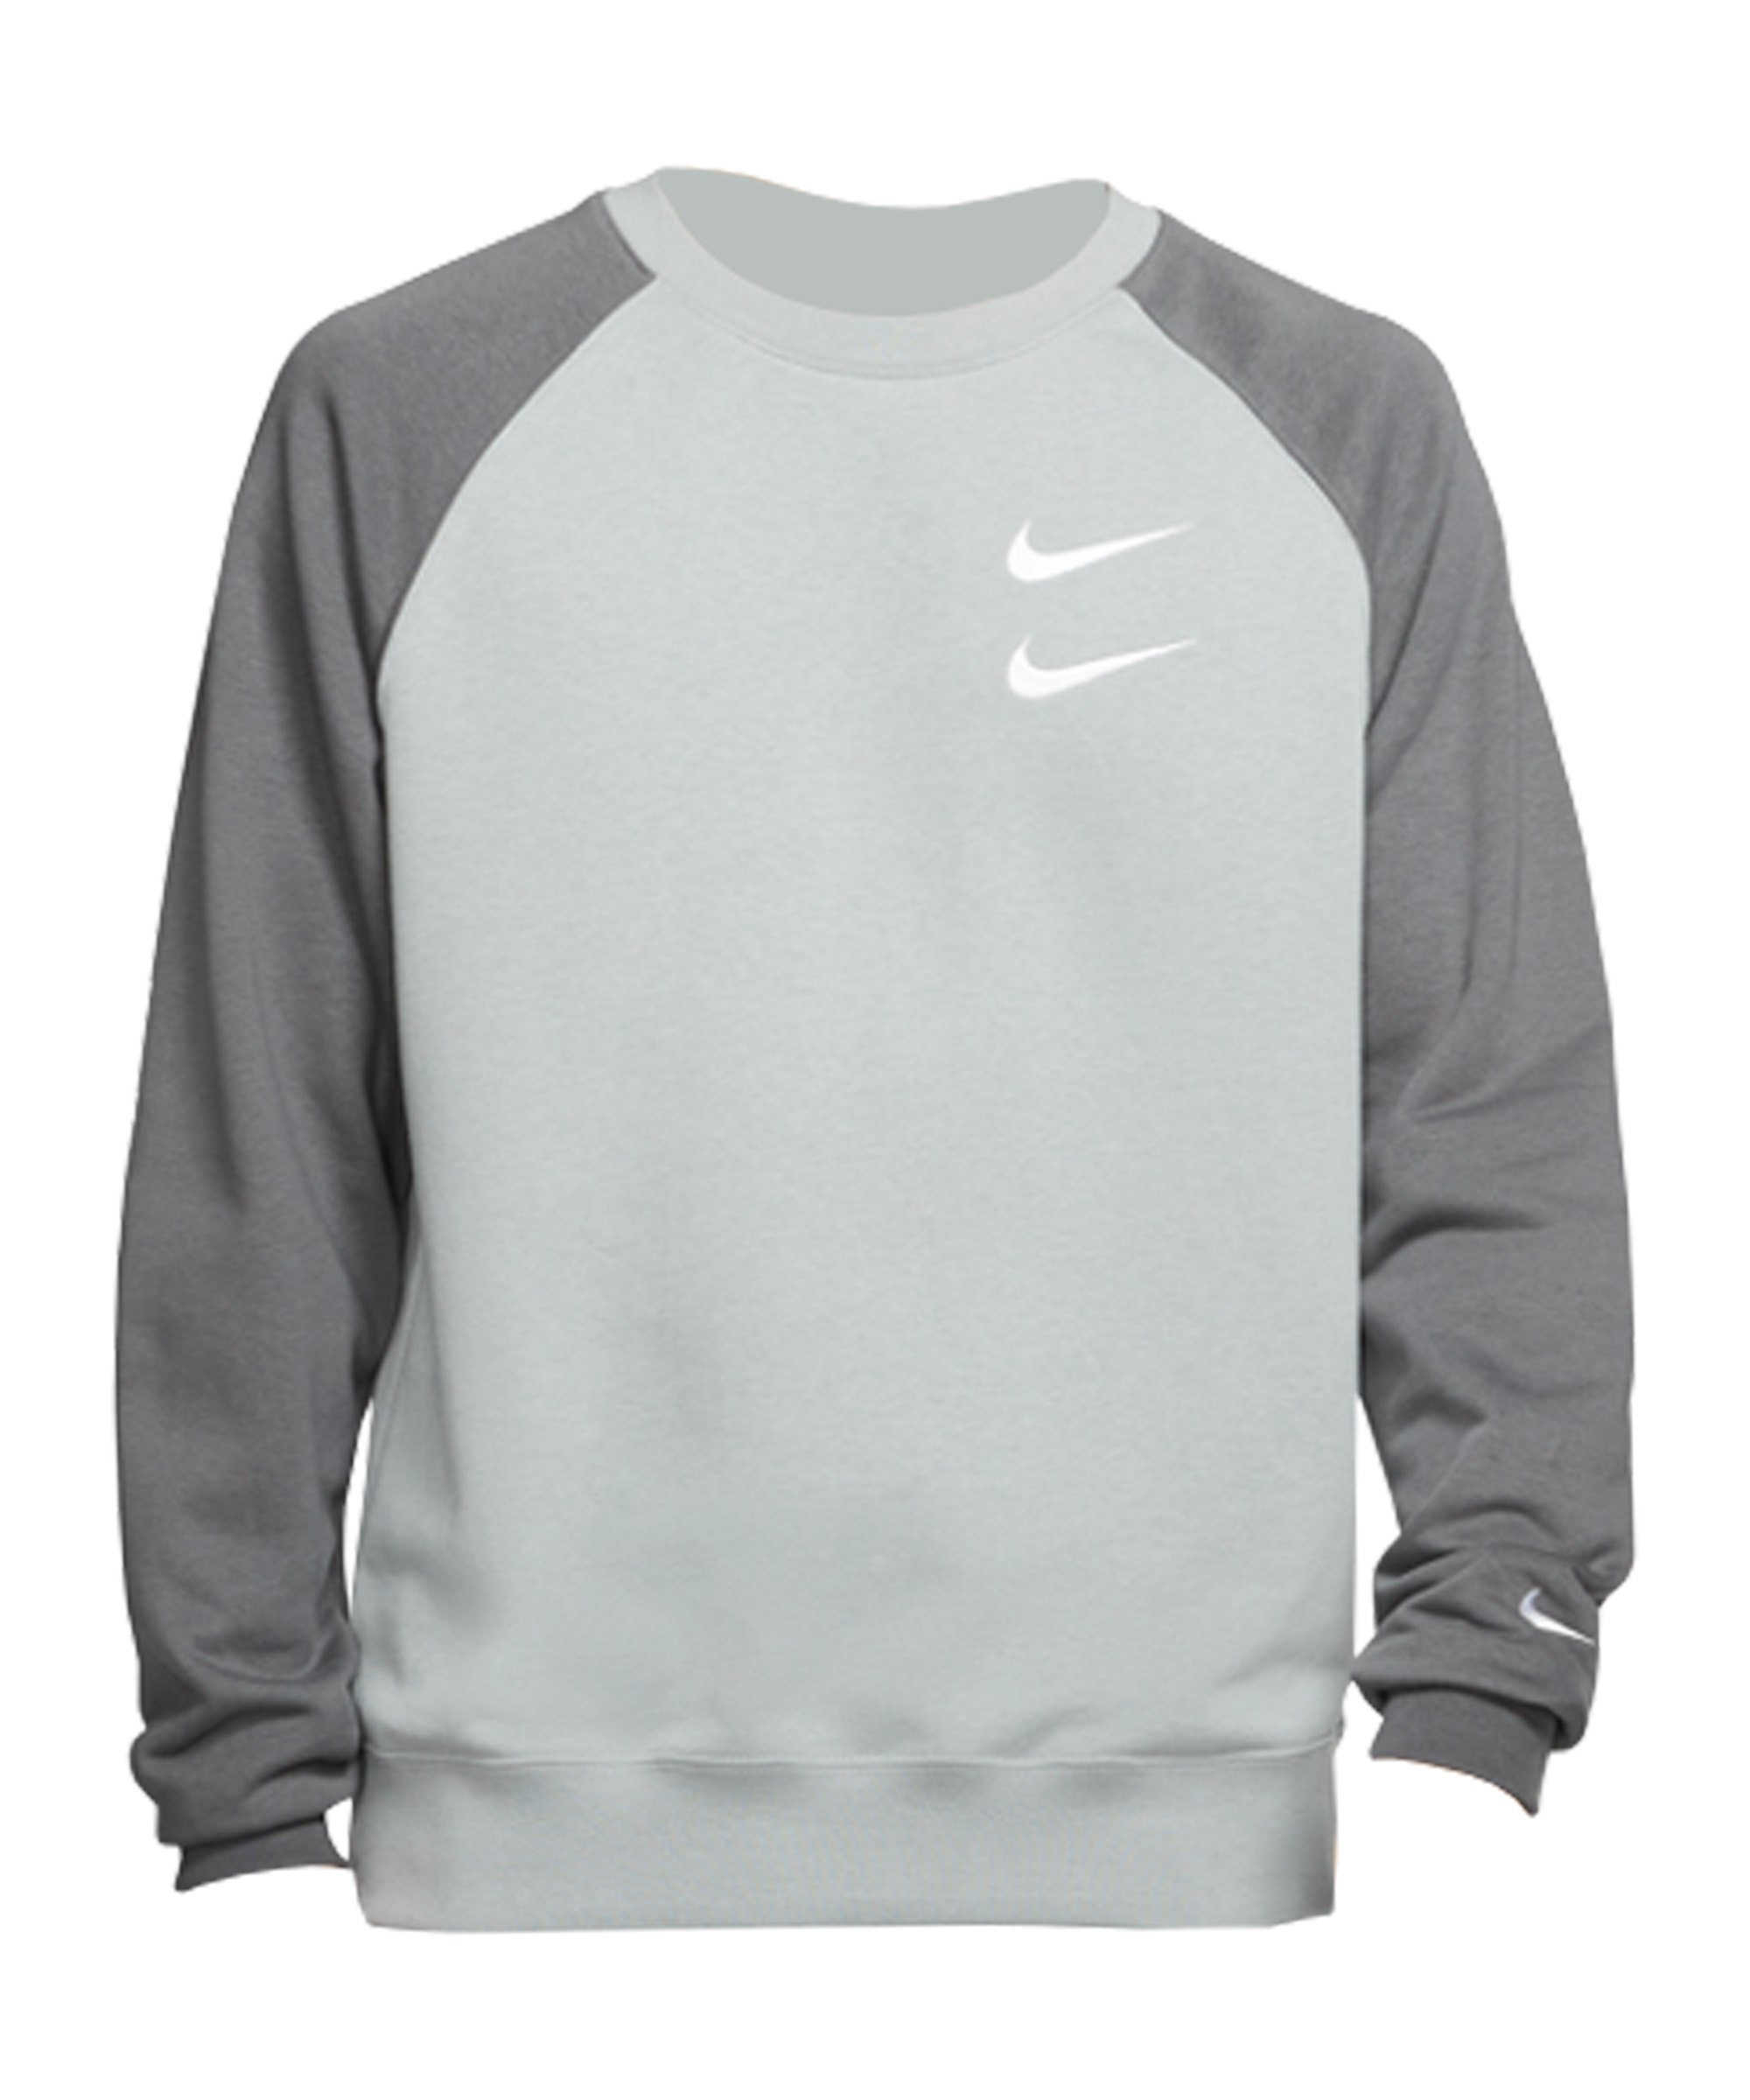 Nike Swoosh French Terry Crew Sweatshirt F073 - grau